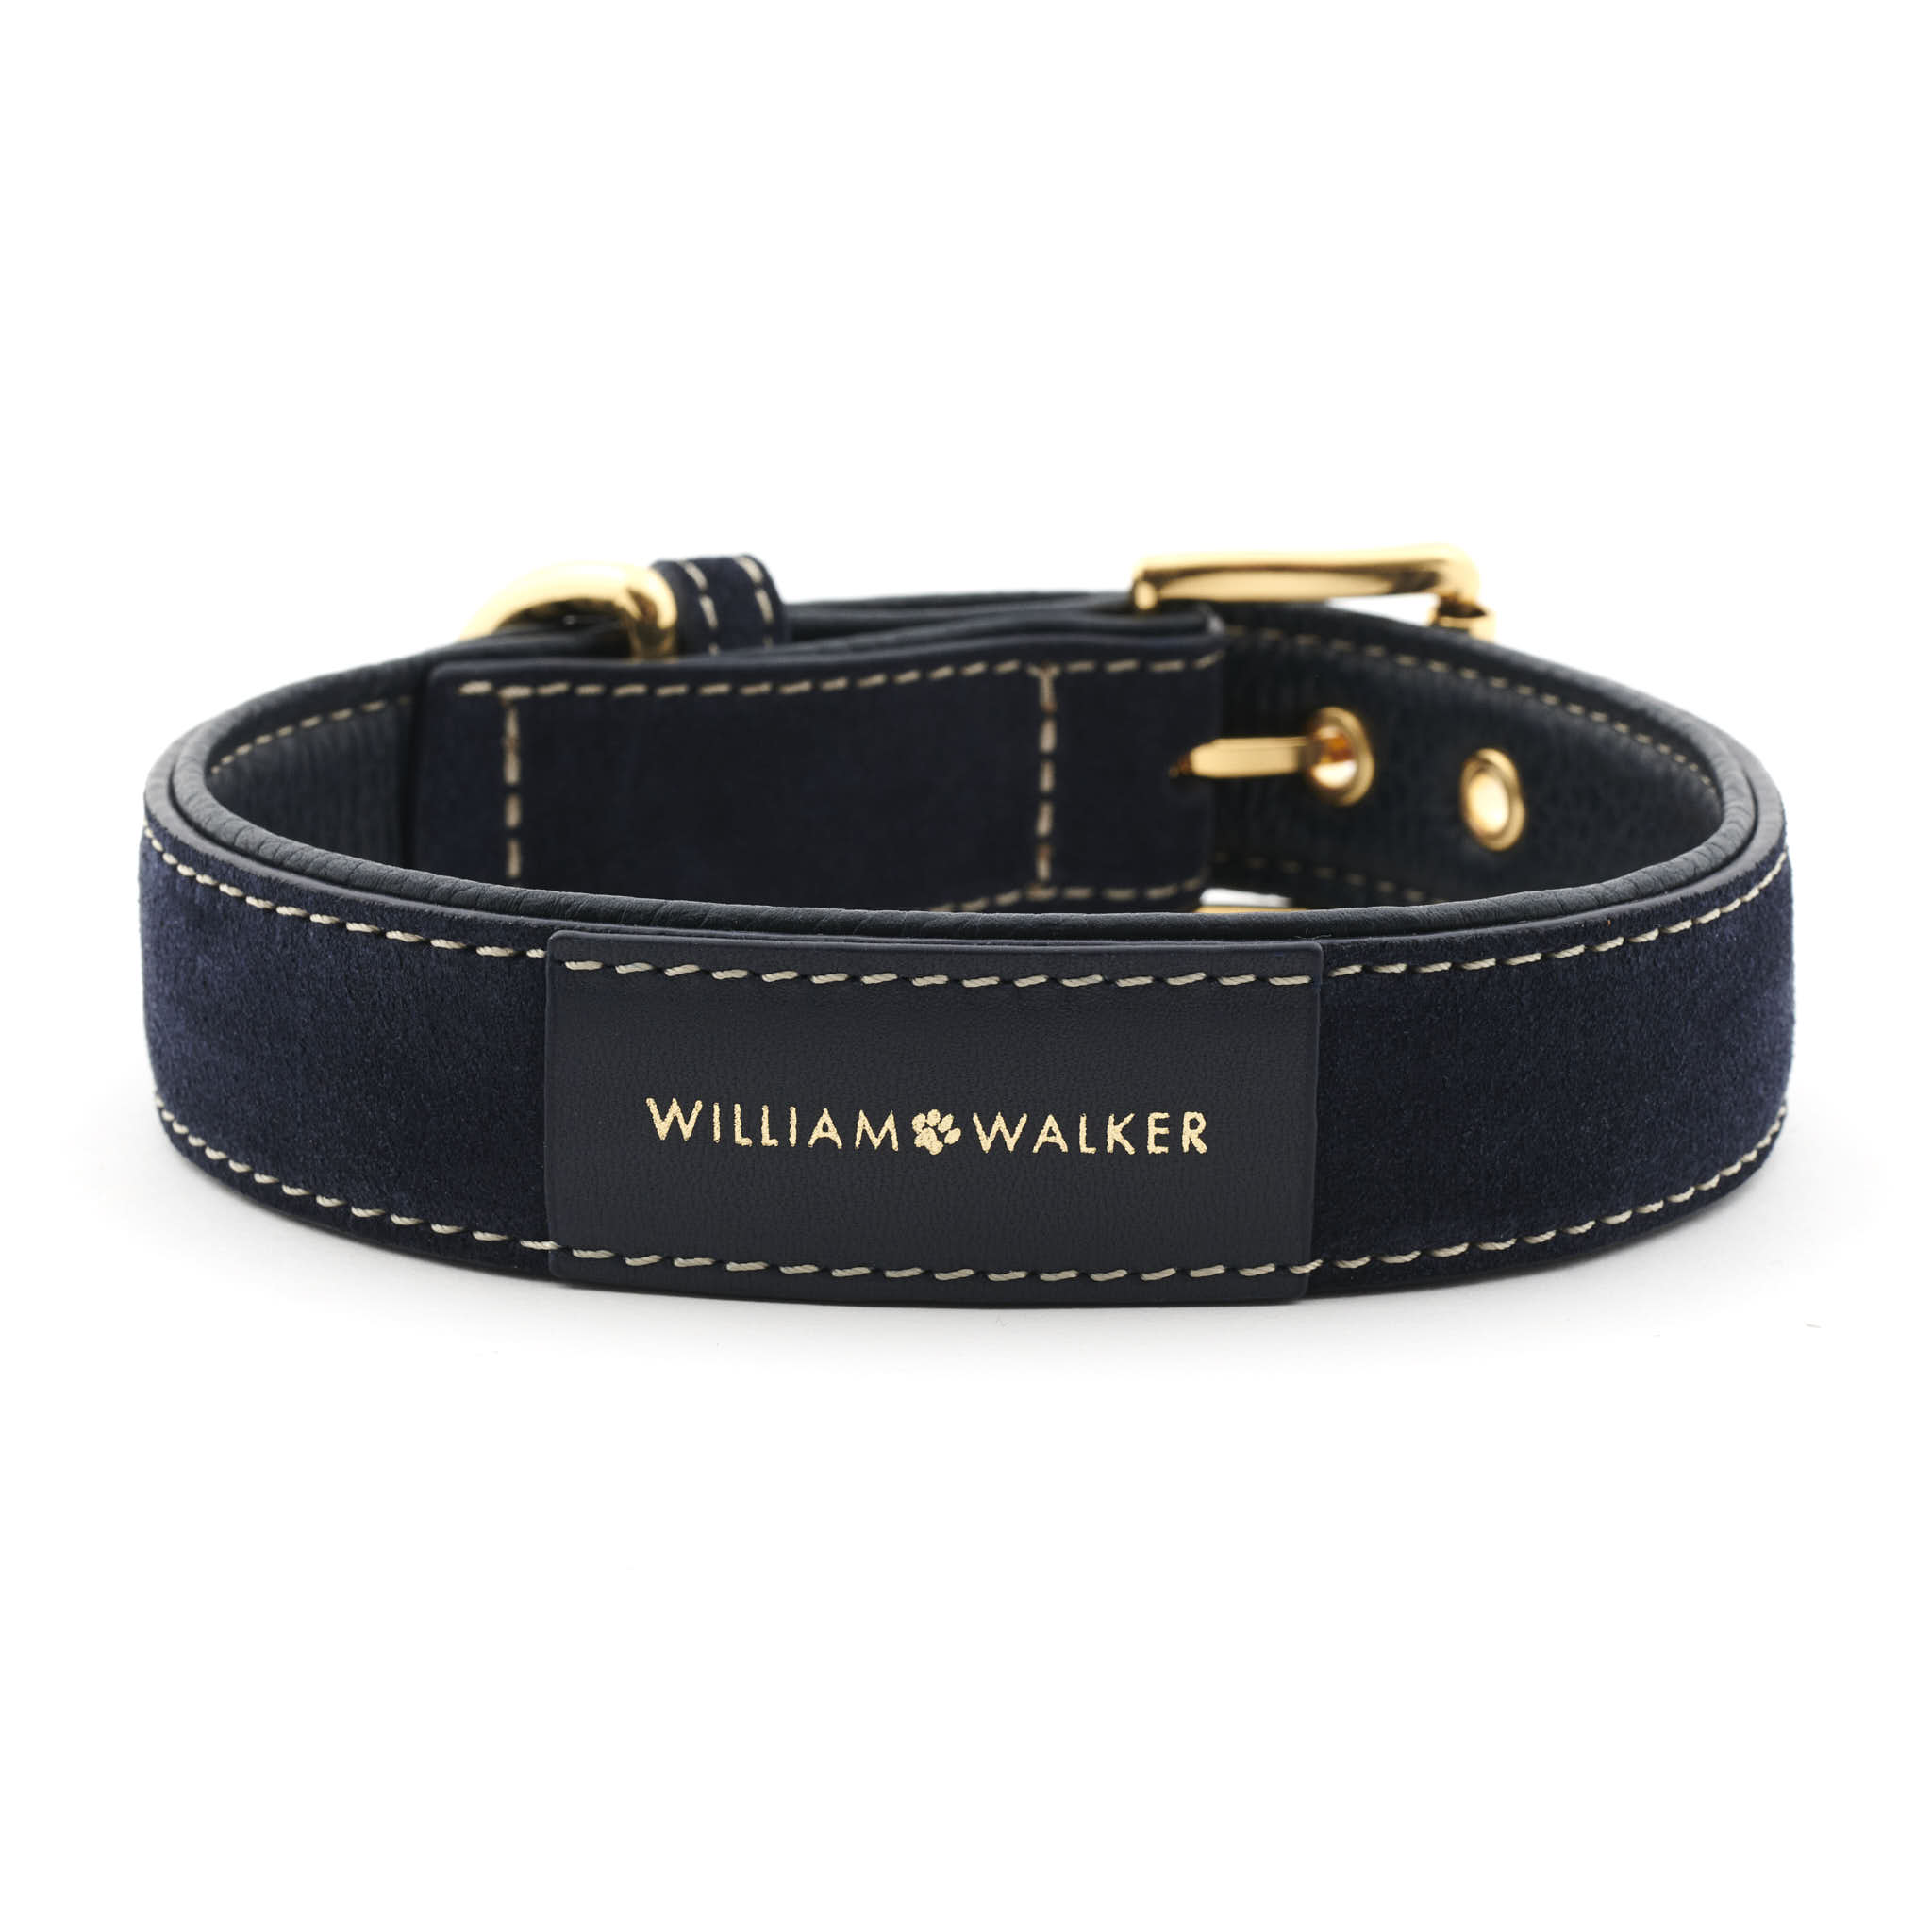 Hundehalsband dunkelblau William Walker dunkelblau front